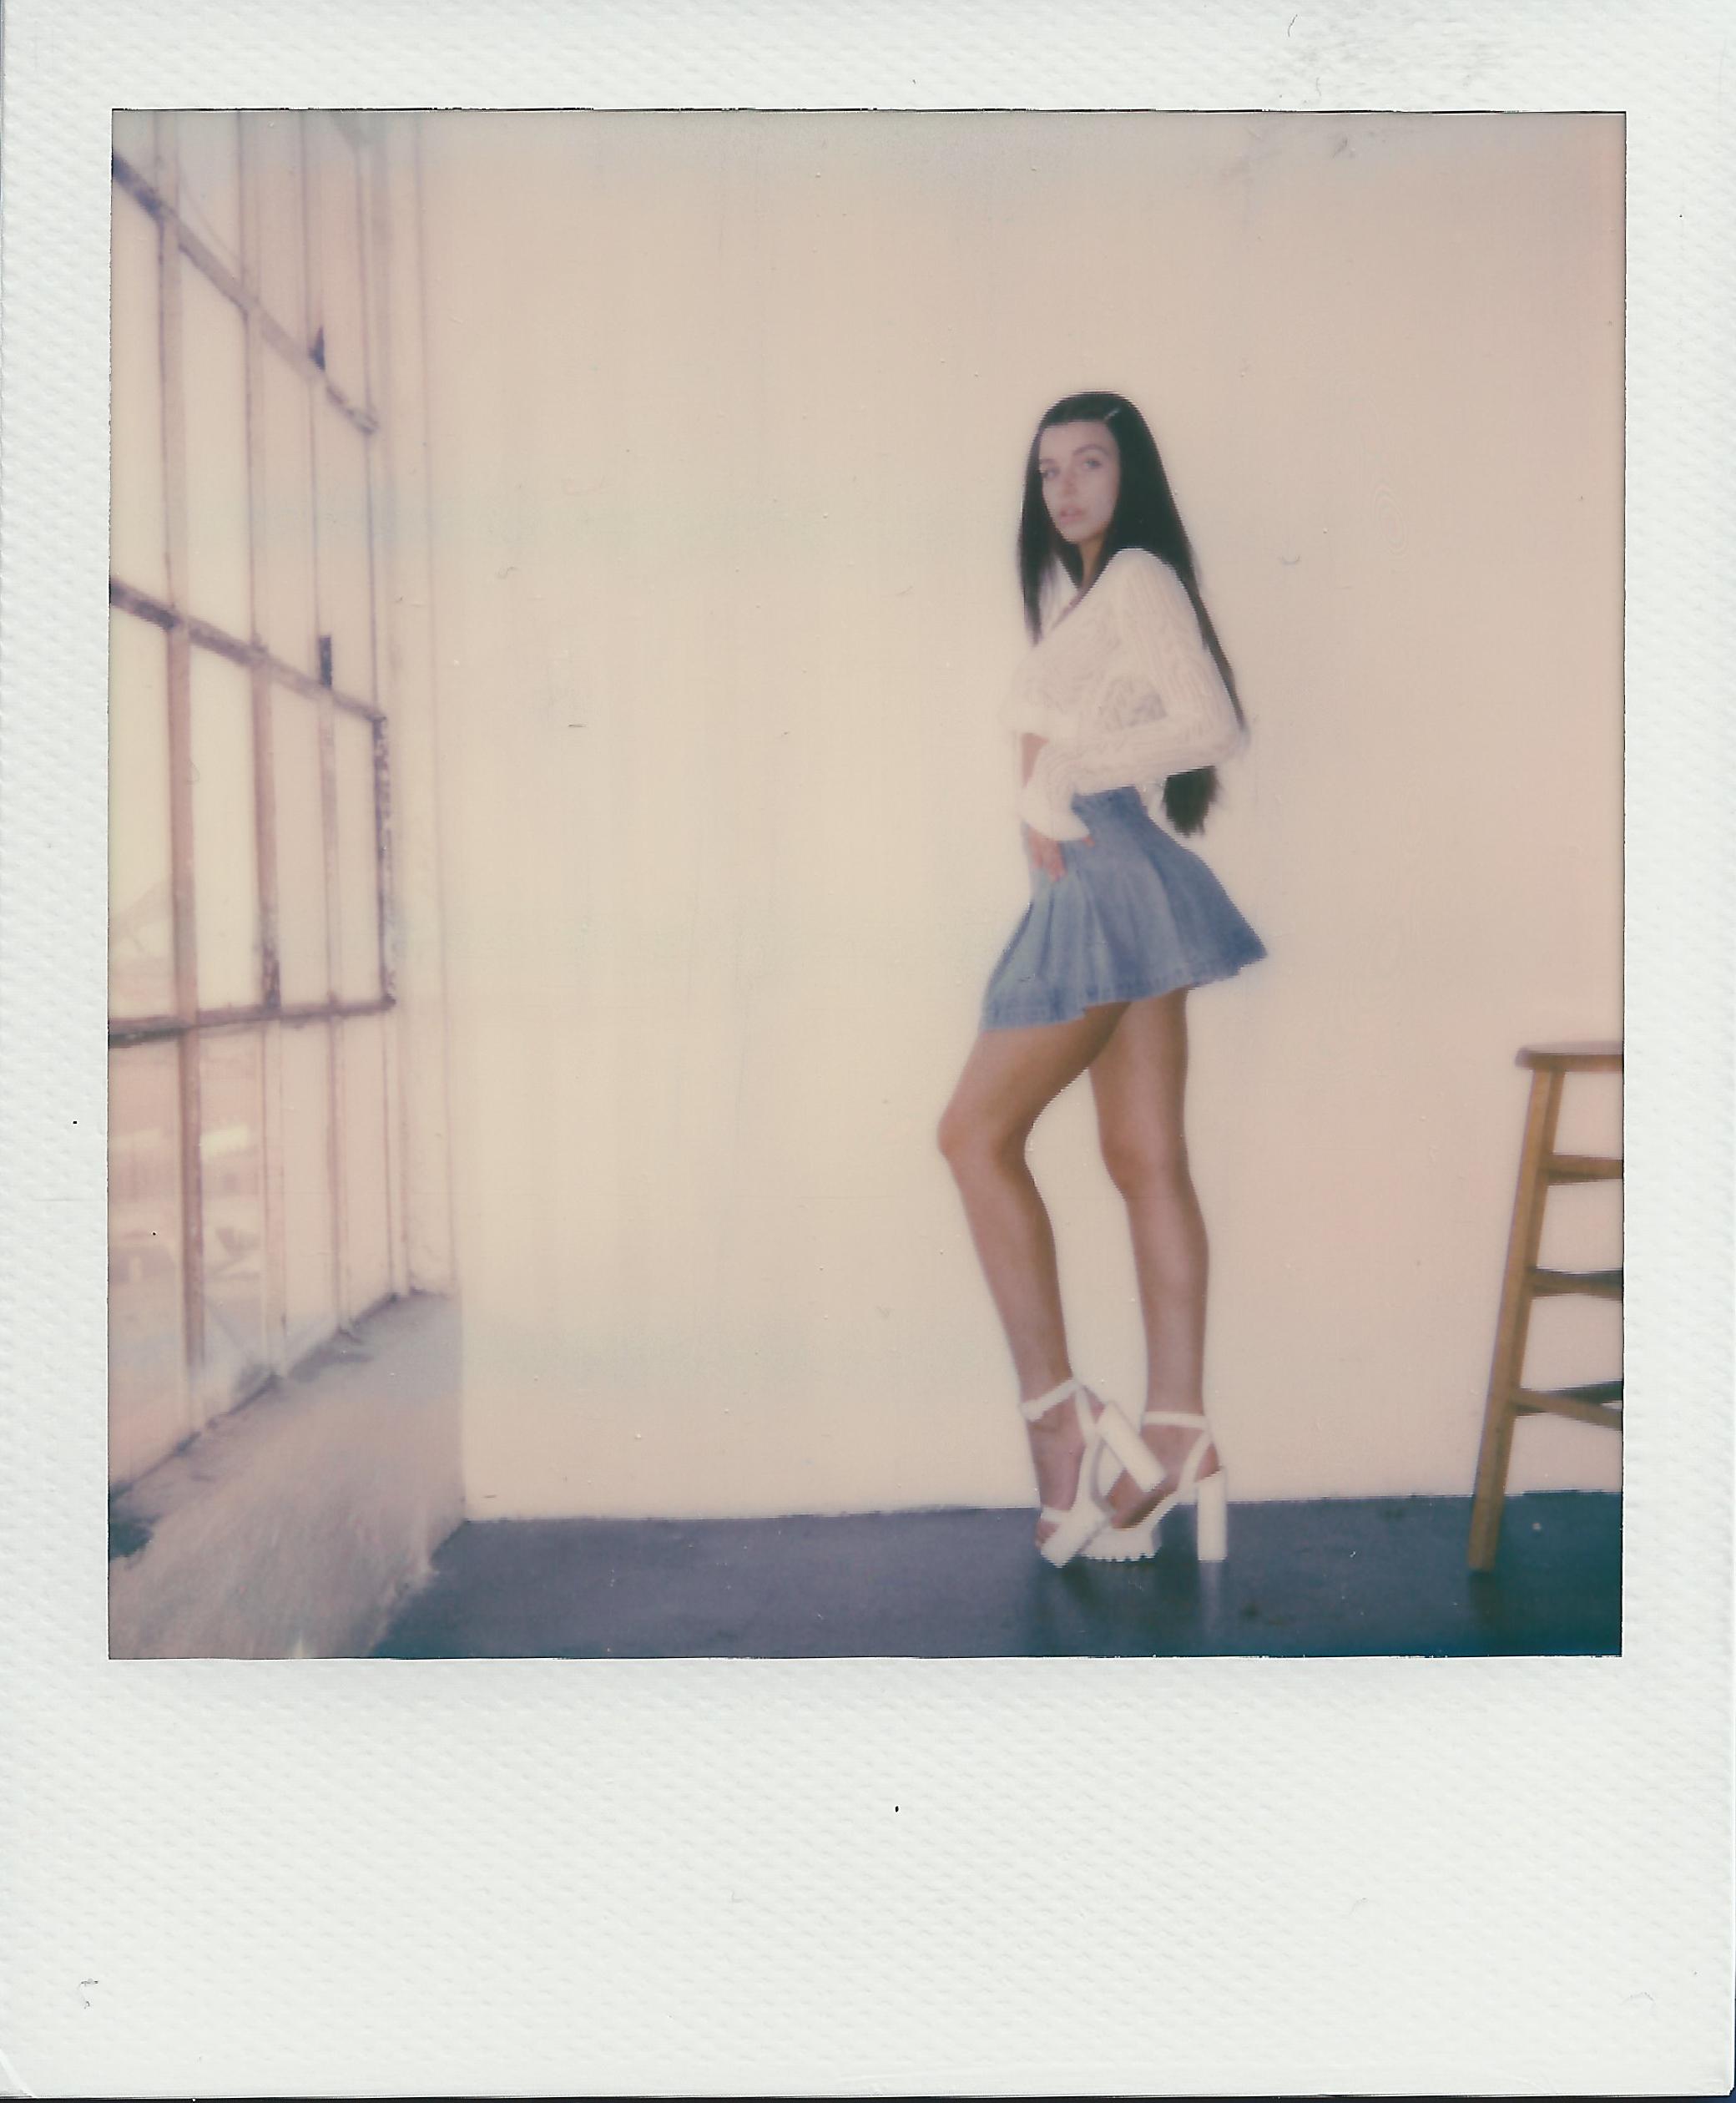 @kattyyya // Polaroid